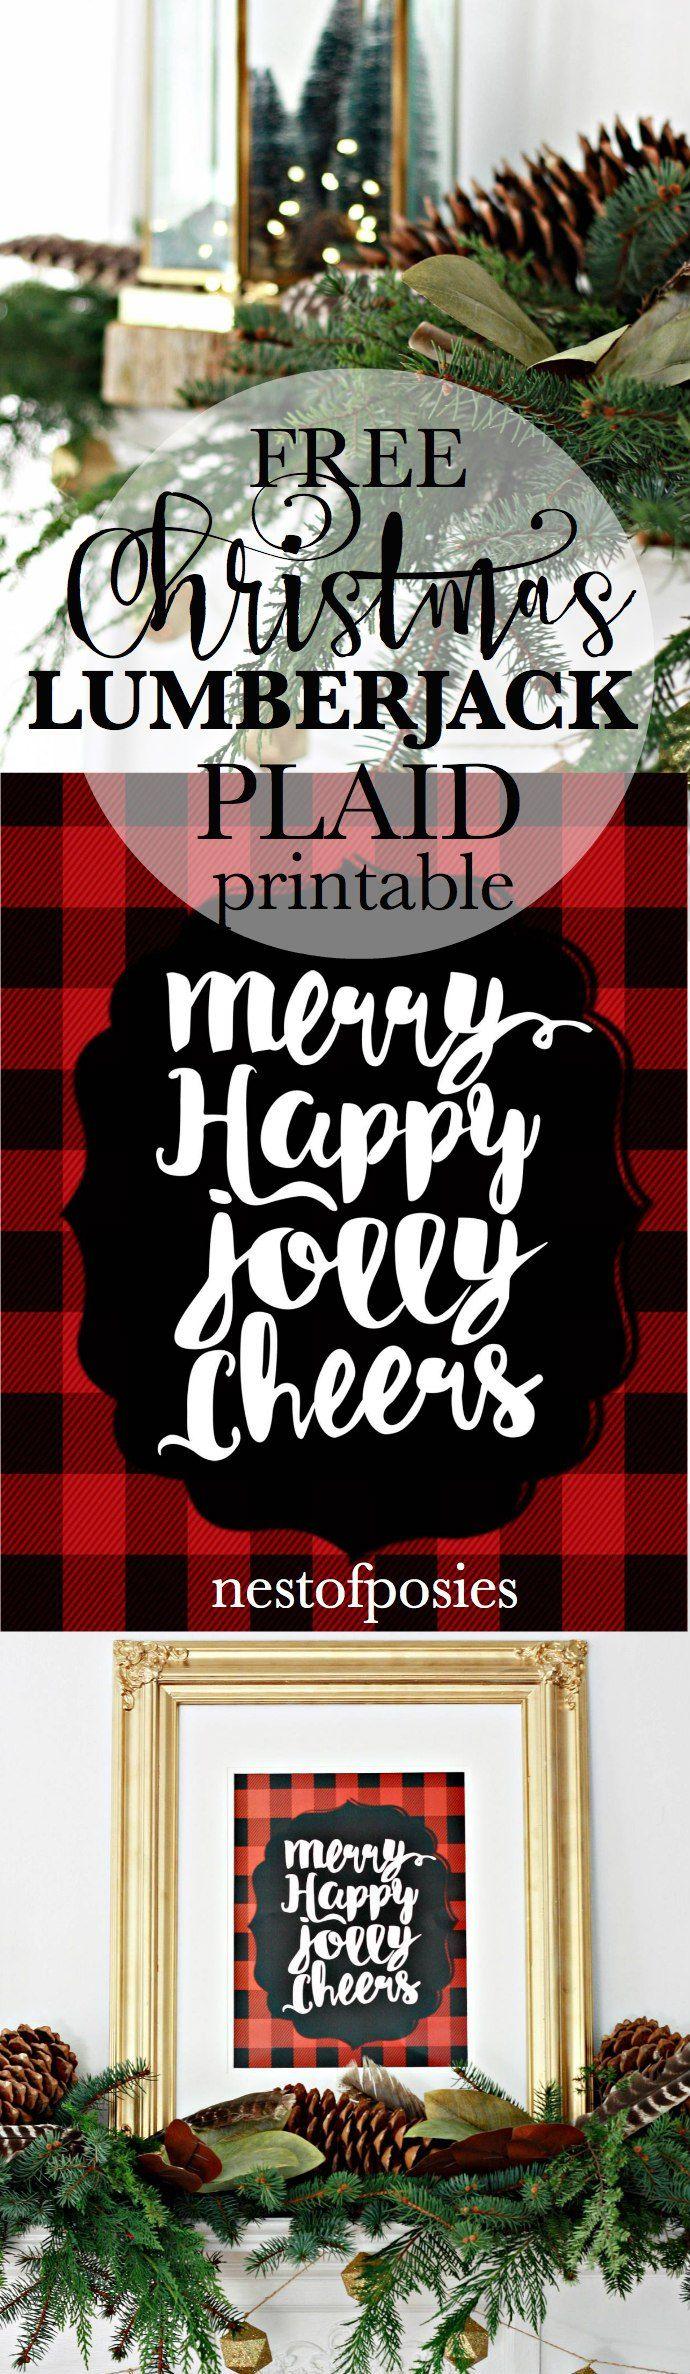 Free Christmas Lumberjack Plaid Printable in 8x10 or 11x14 downloads